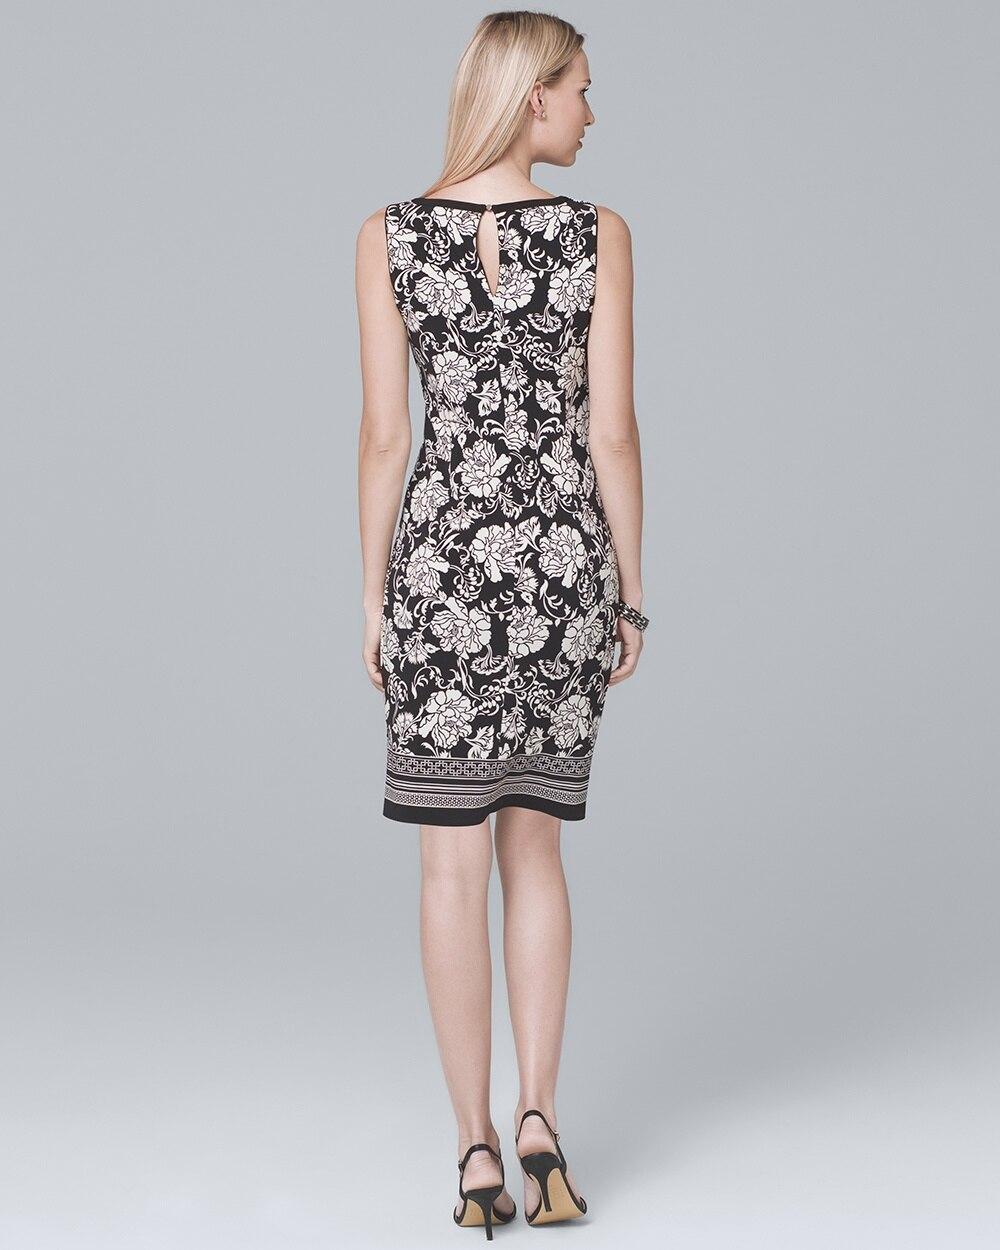 7e99ff048f Return to thumbnail image selection Reversible Border-Trim Floral Knit  Sheath Dress